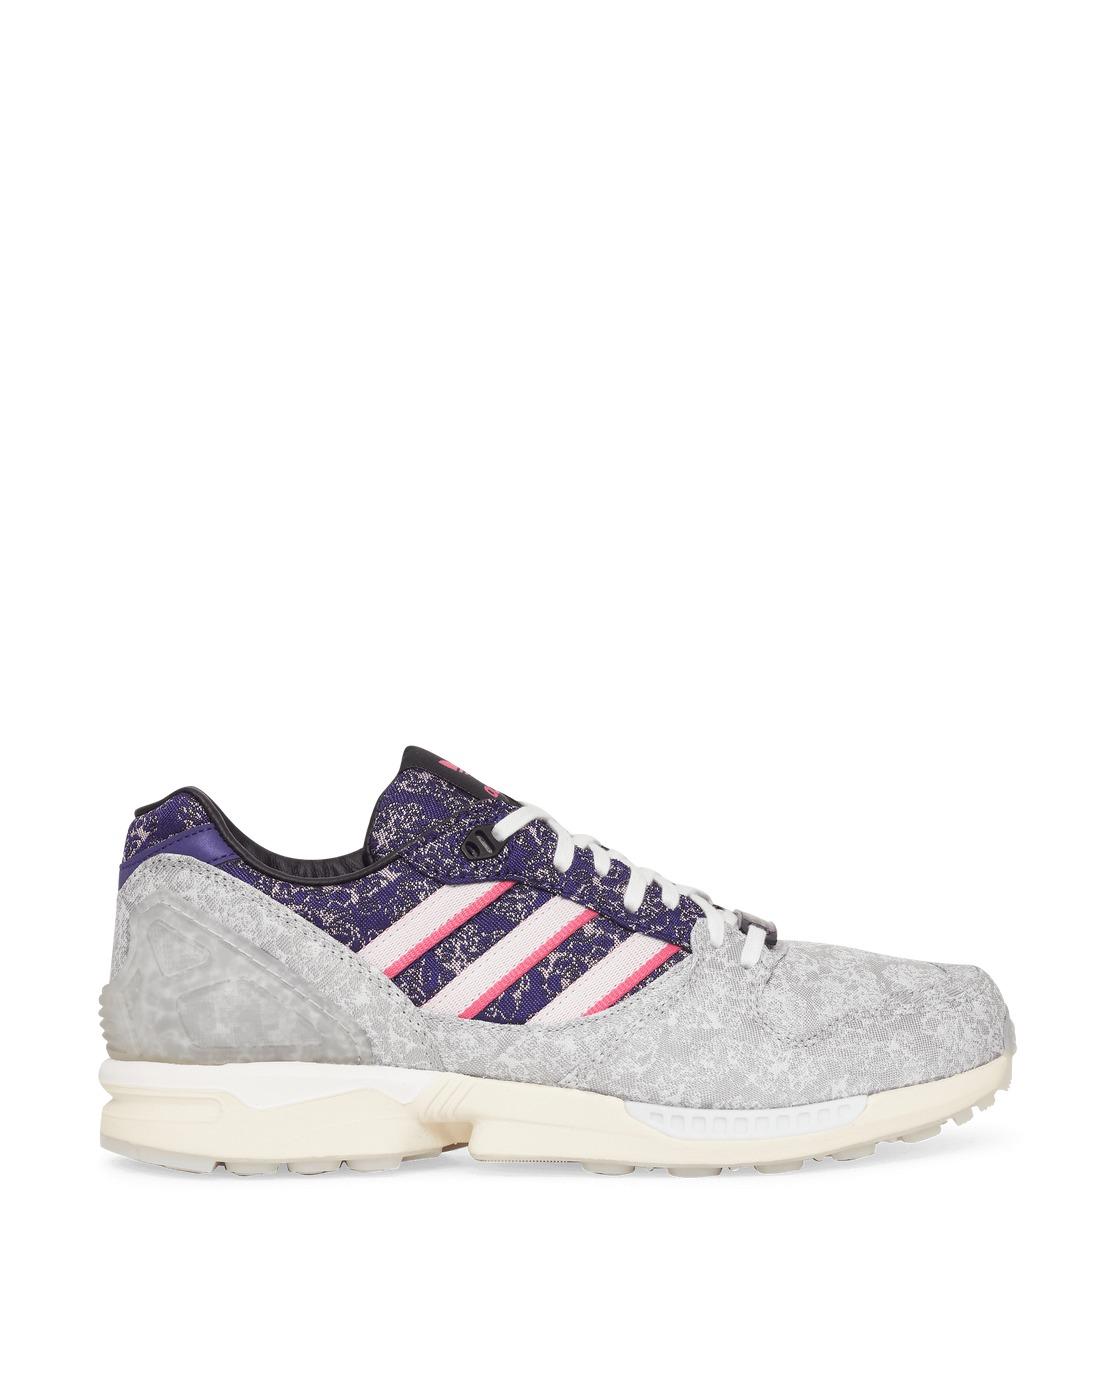 Adidas Originals Azx: V   Vieux Lyon Zx8000 Sneakers Silver Met/Pink